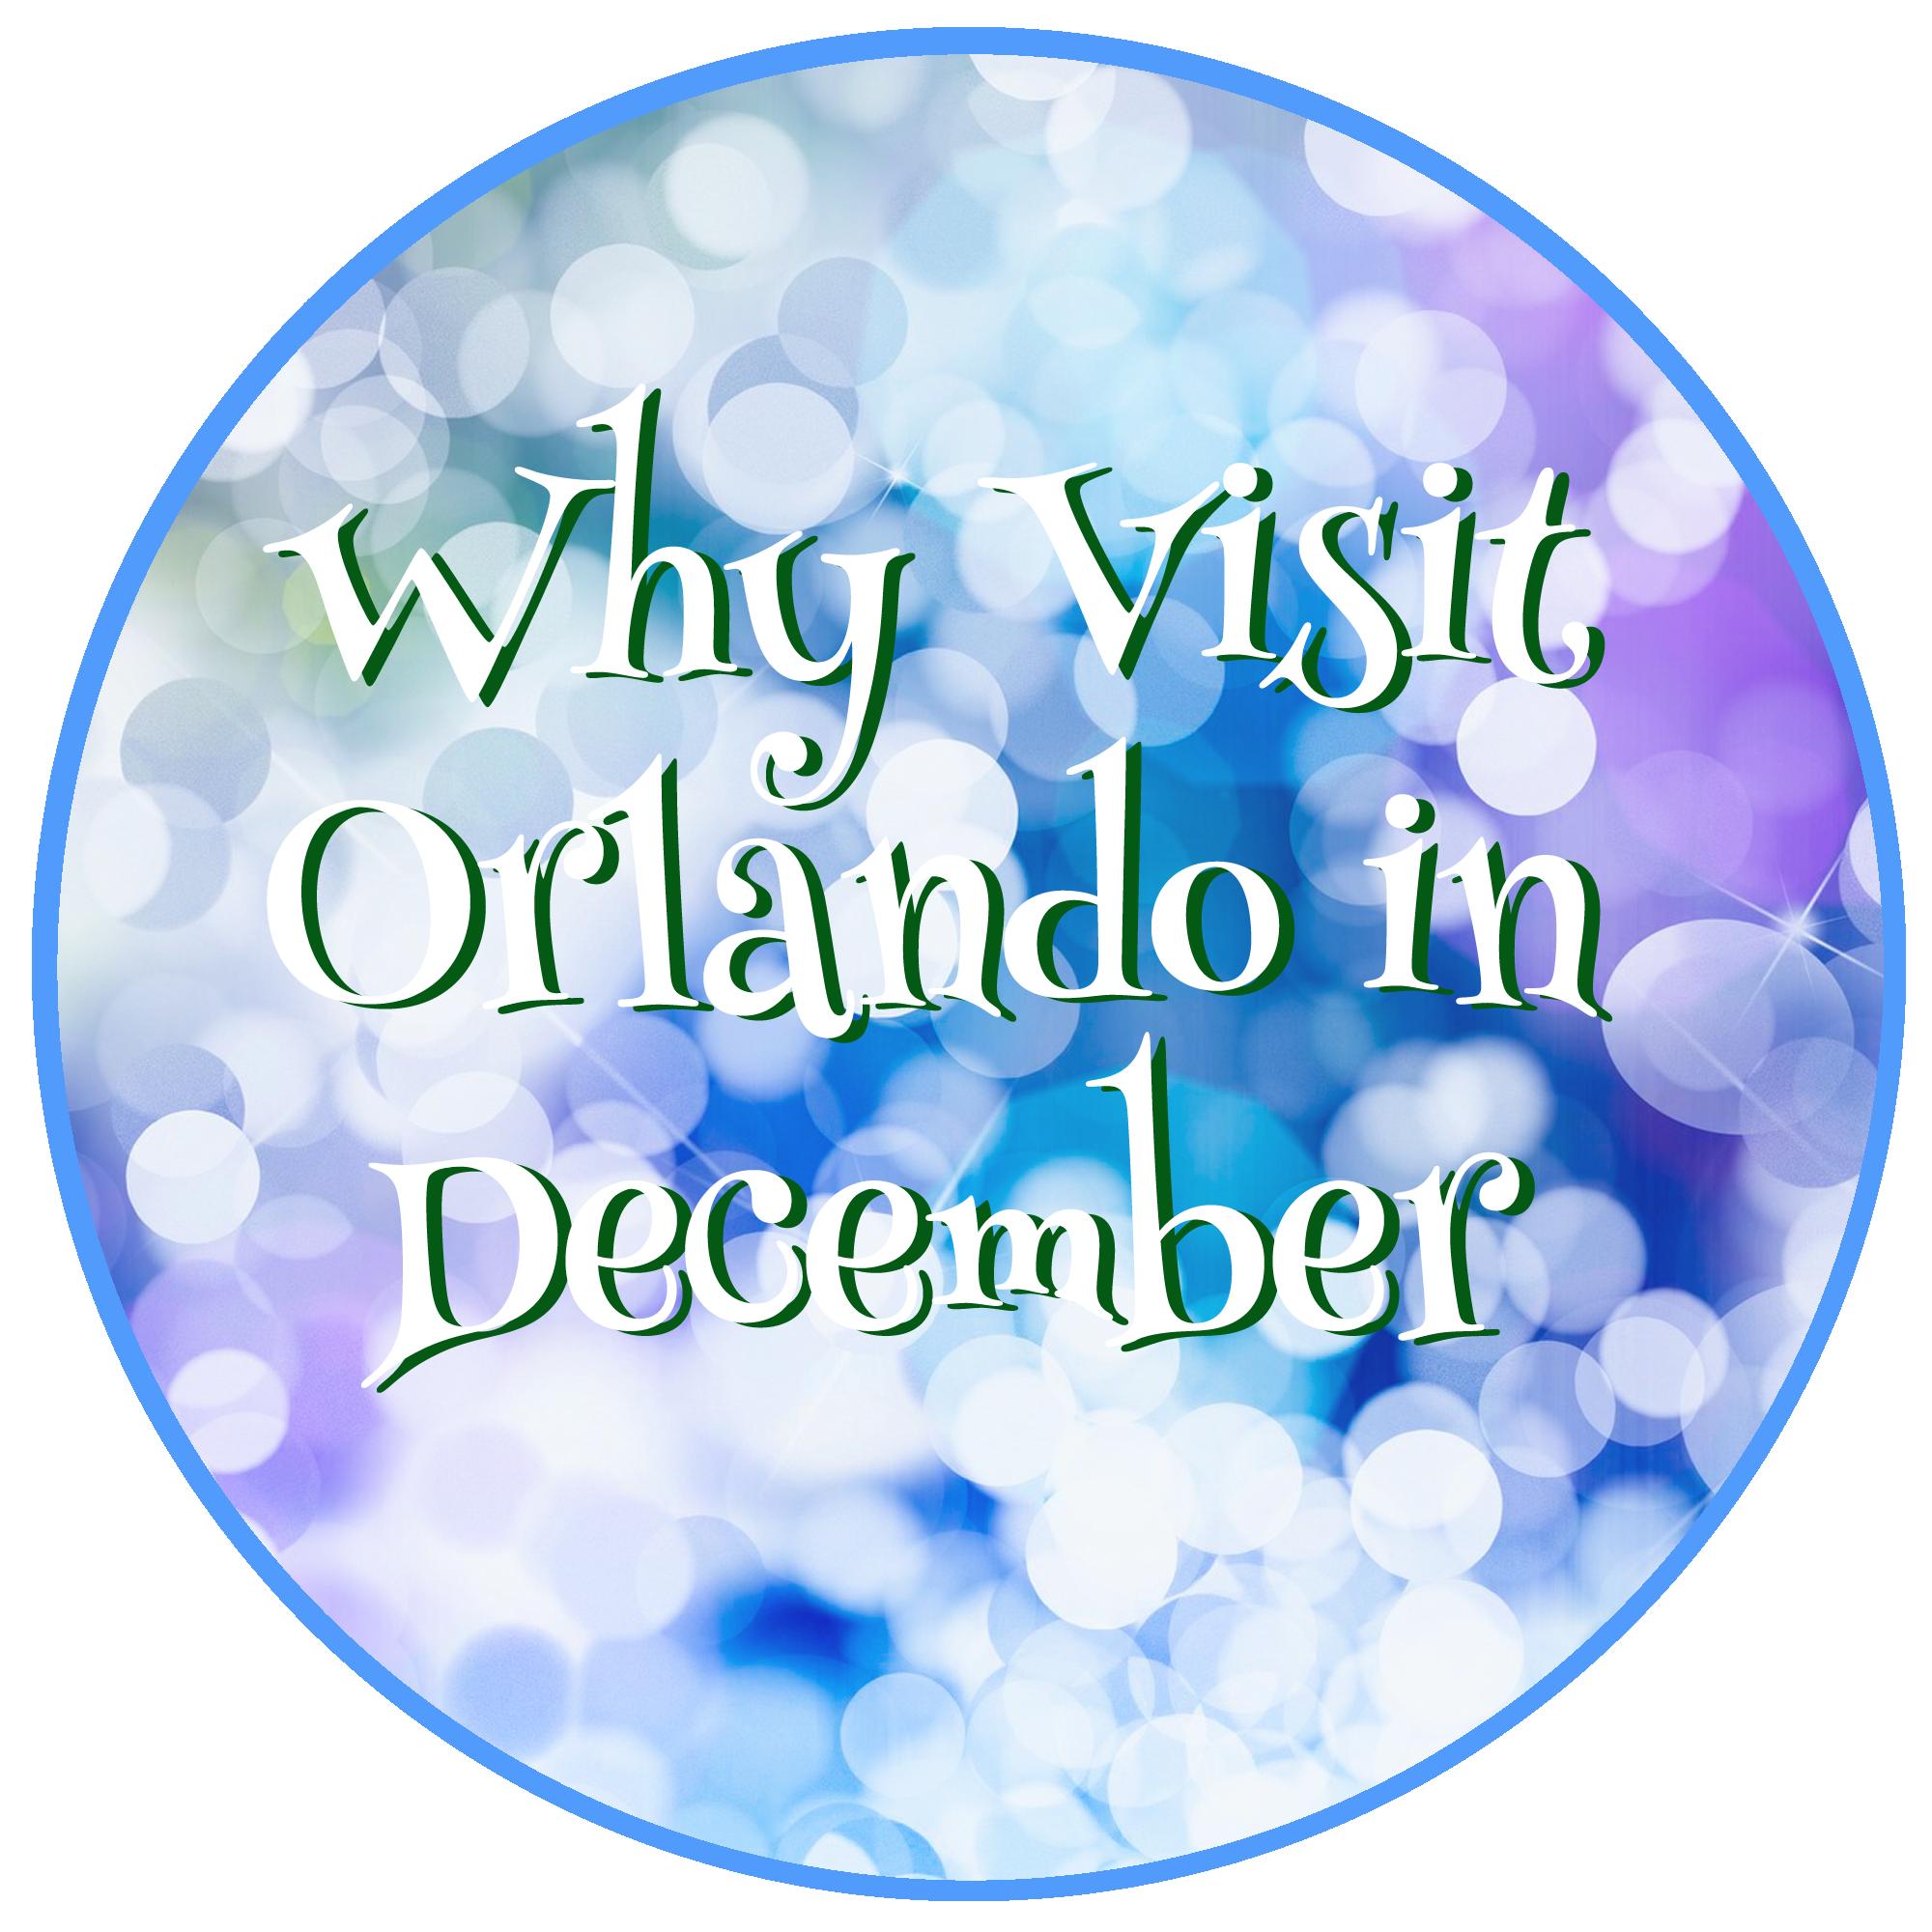 Why Visit Orlando in December.